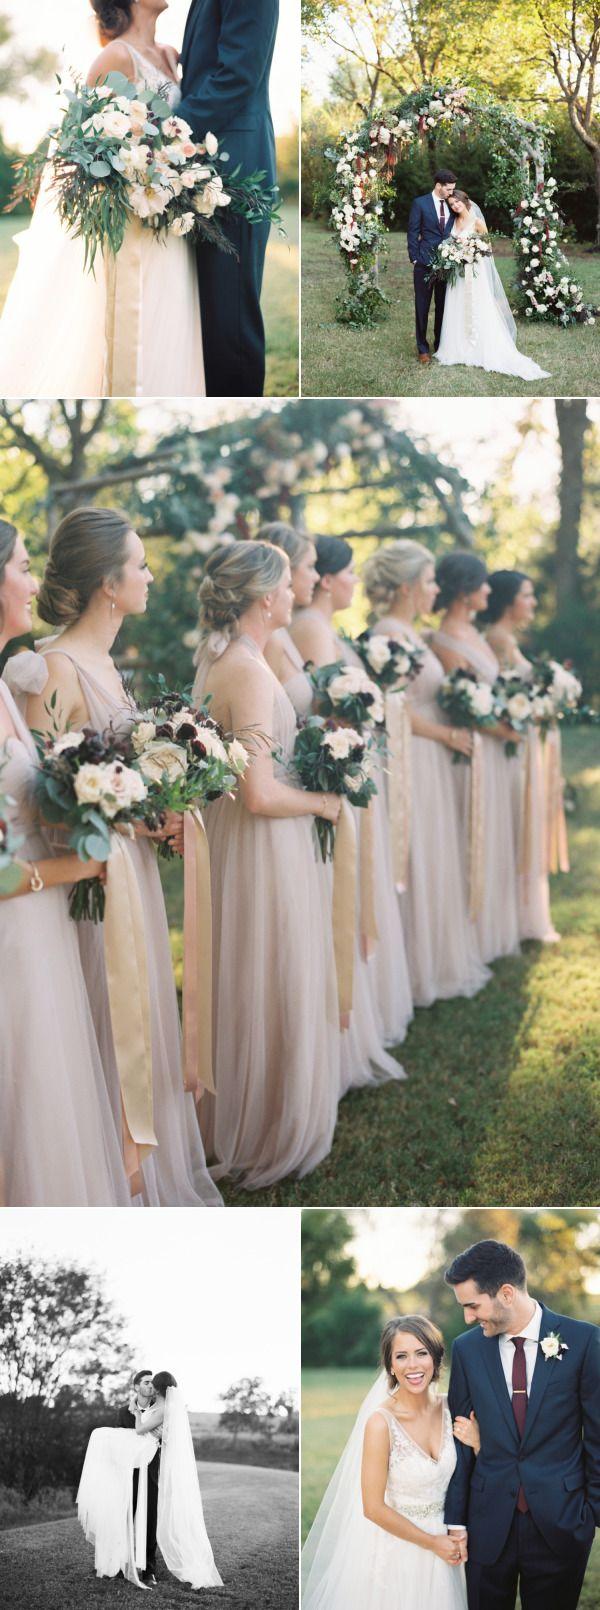 Classic Burgundy + Navy Fall Wedding – Style Me Pretty